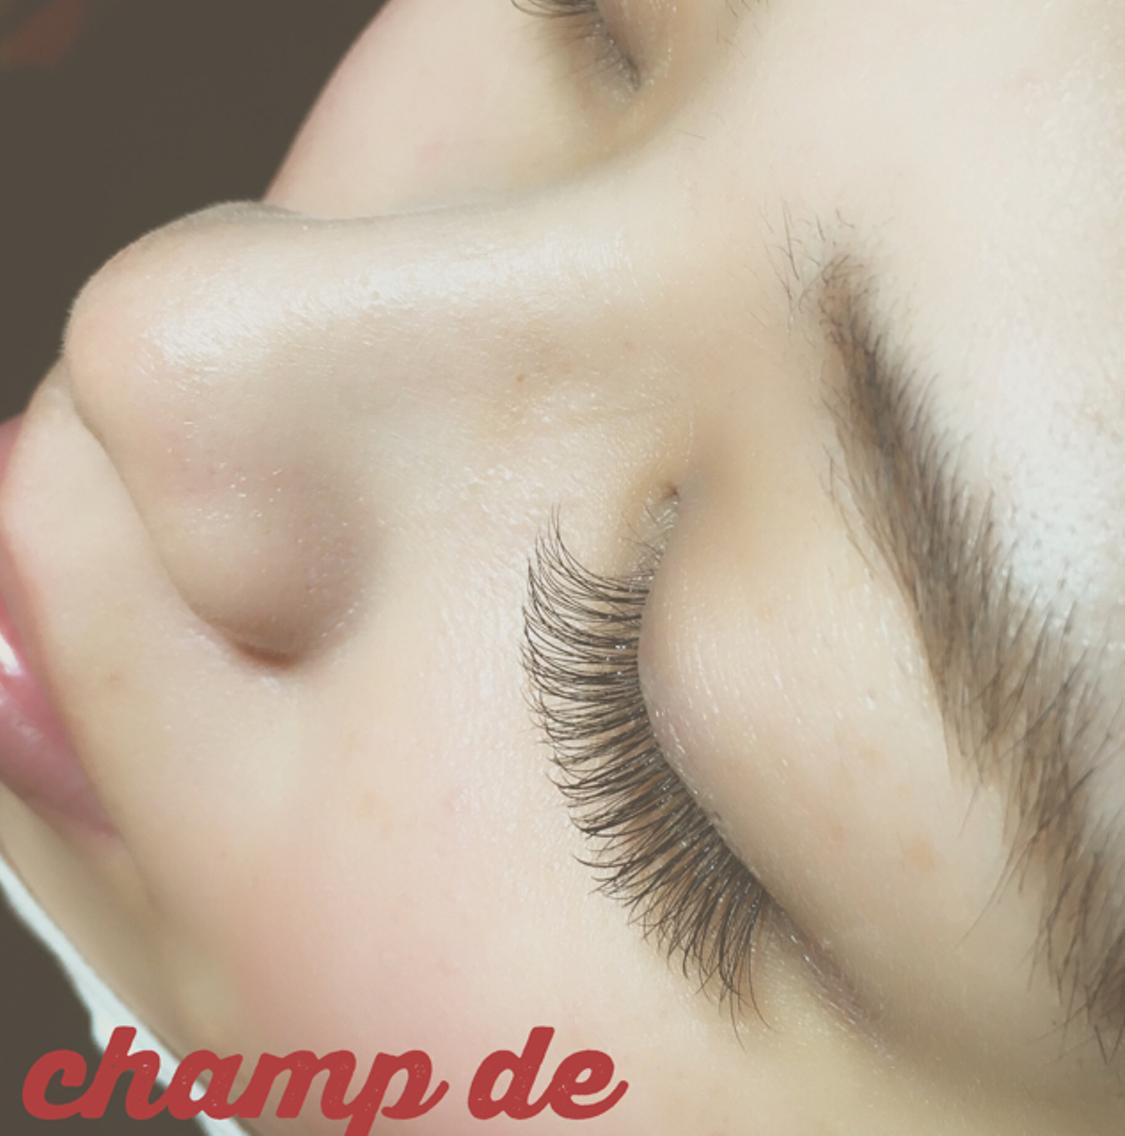 champ de   (シャン ドゥ)所属・champdeeyelashの掲載